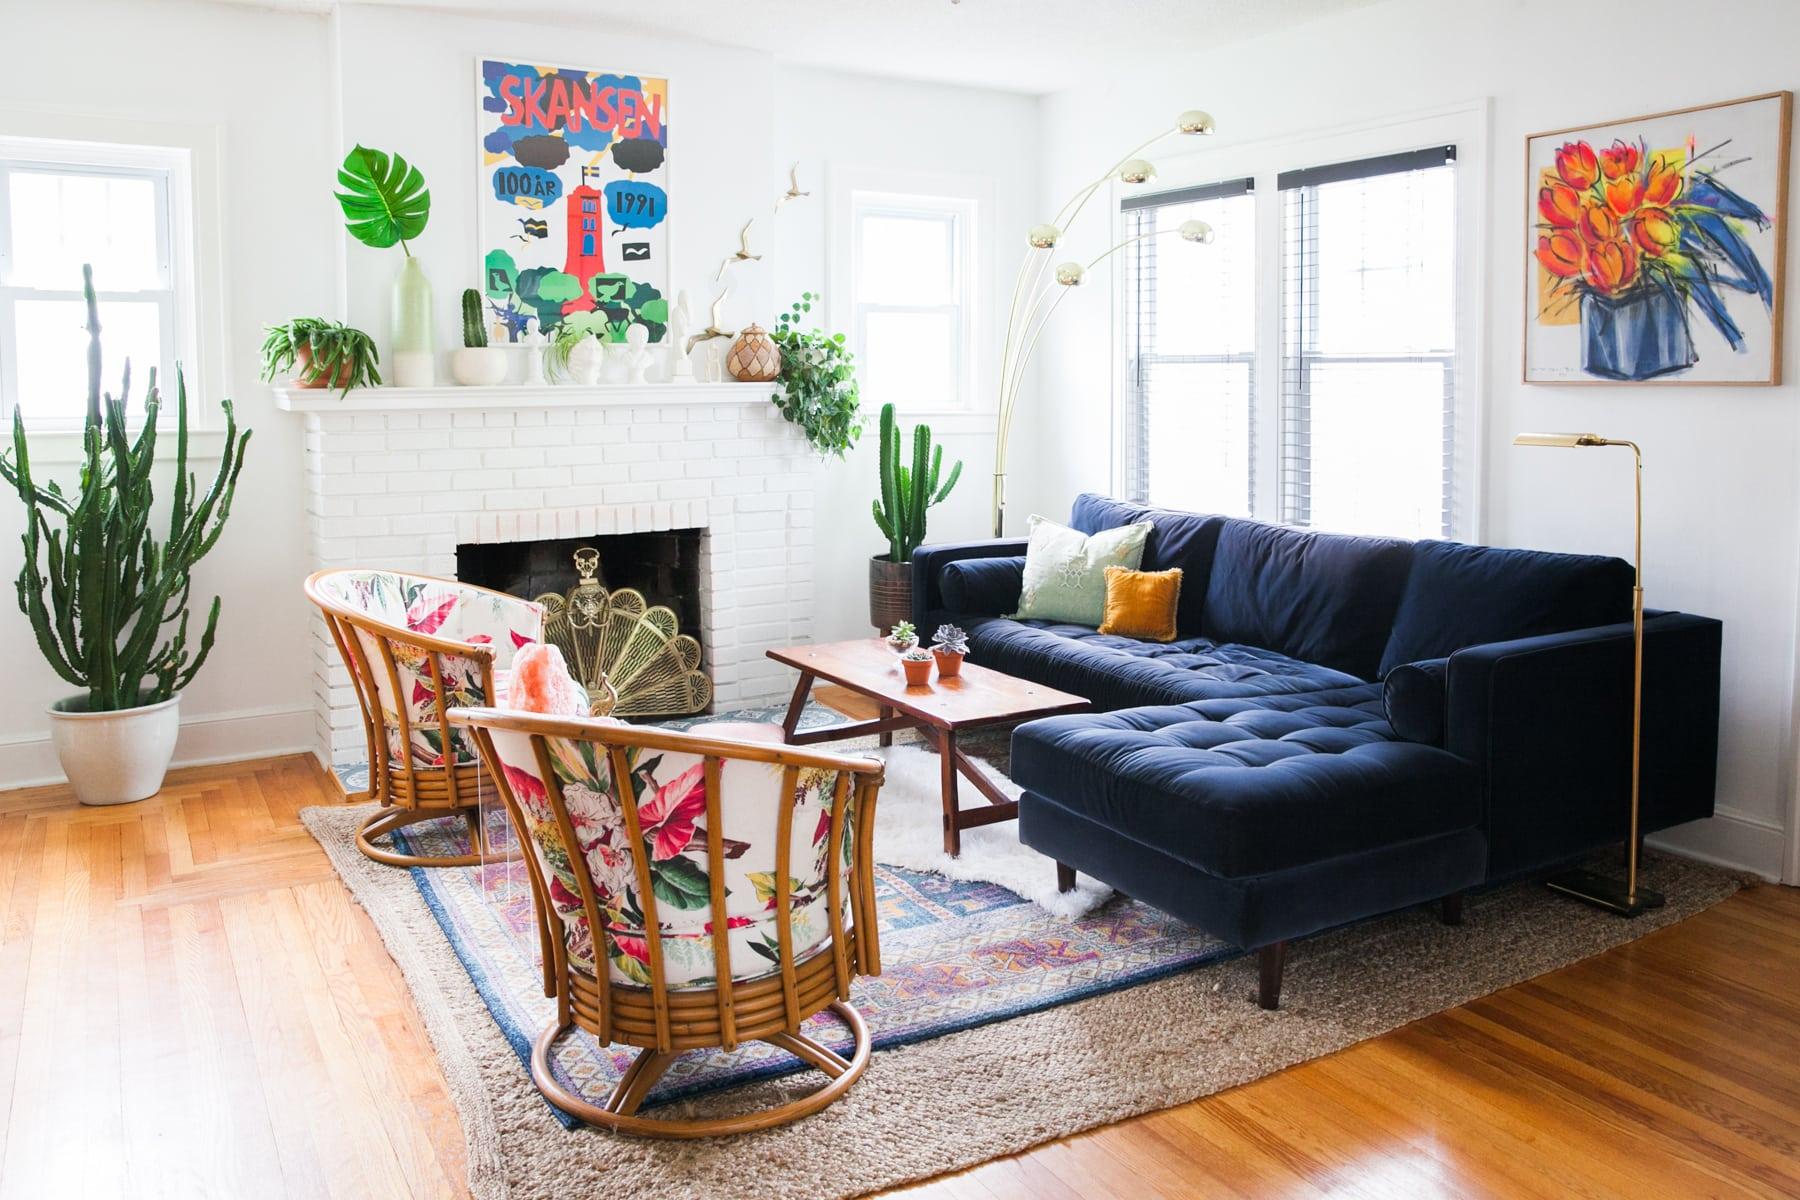 Dream sofa giveaway